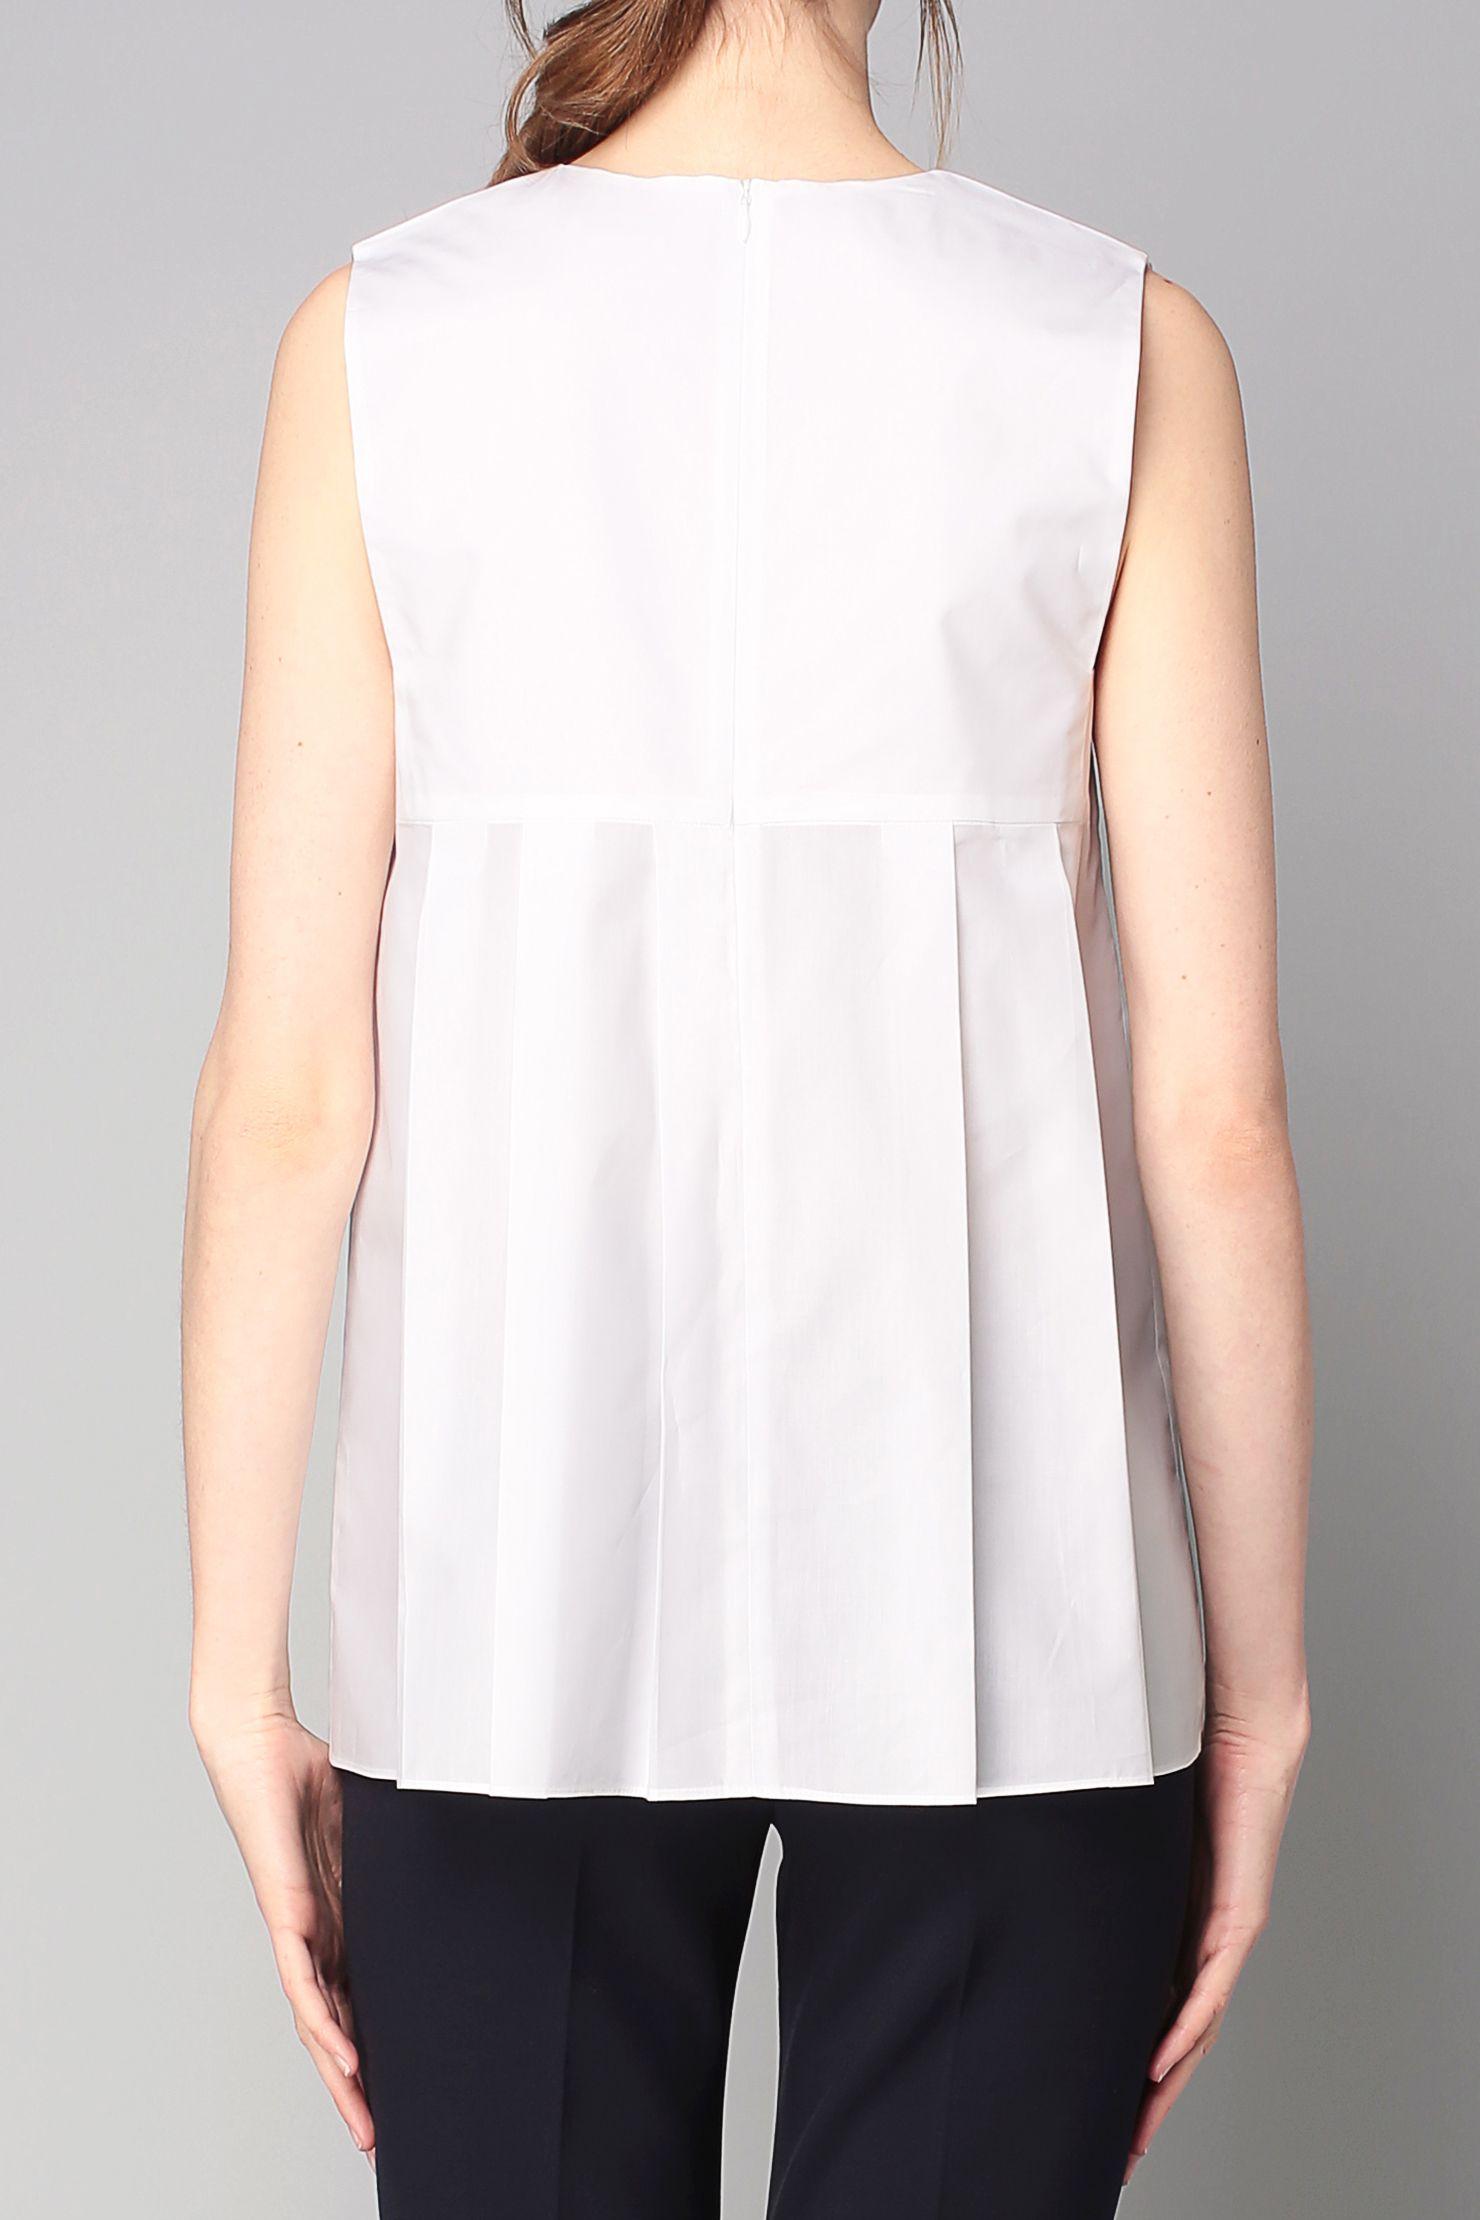 c8115bd6efa5 Débardeur blanc tissu plissé